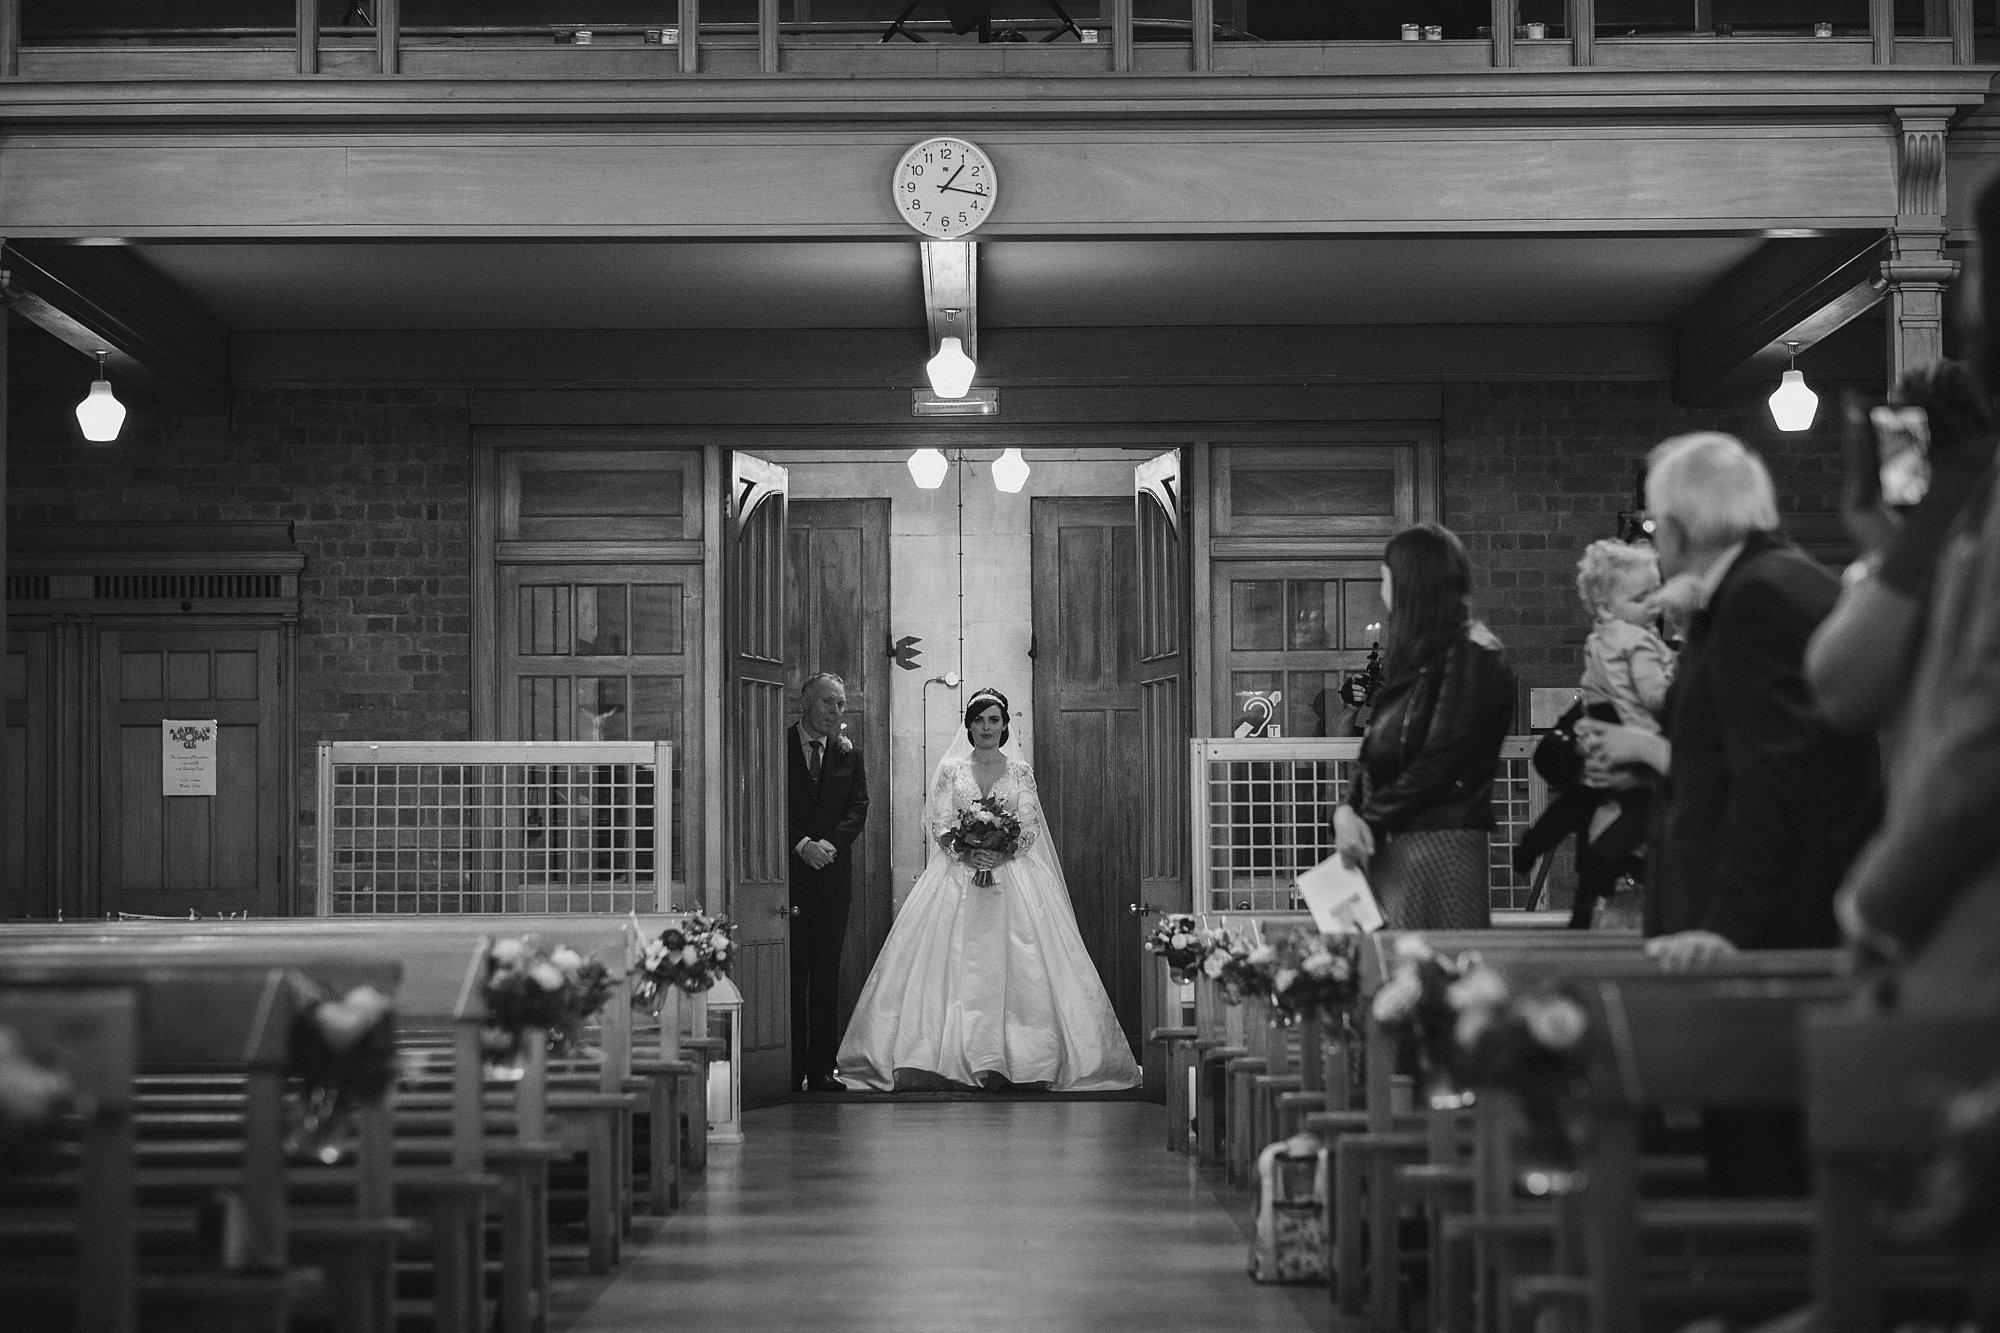 strawberry hill house wedding photographer cc 028 - Strawberry Hill House Wedding Photographer | Charlotte + Cristiano